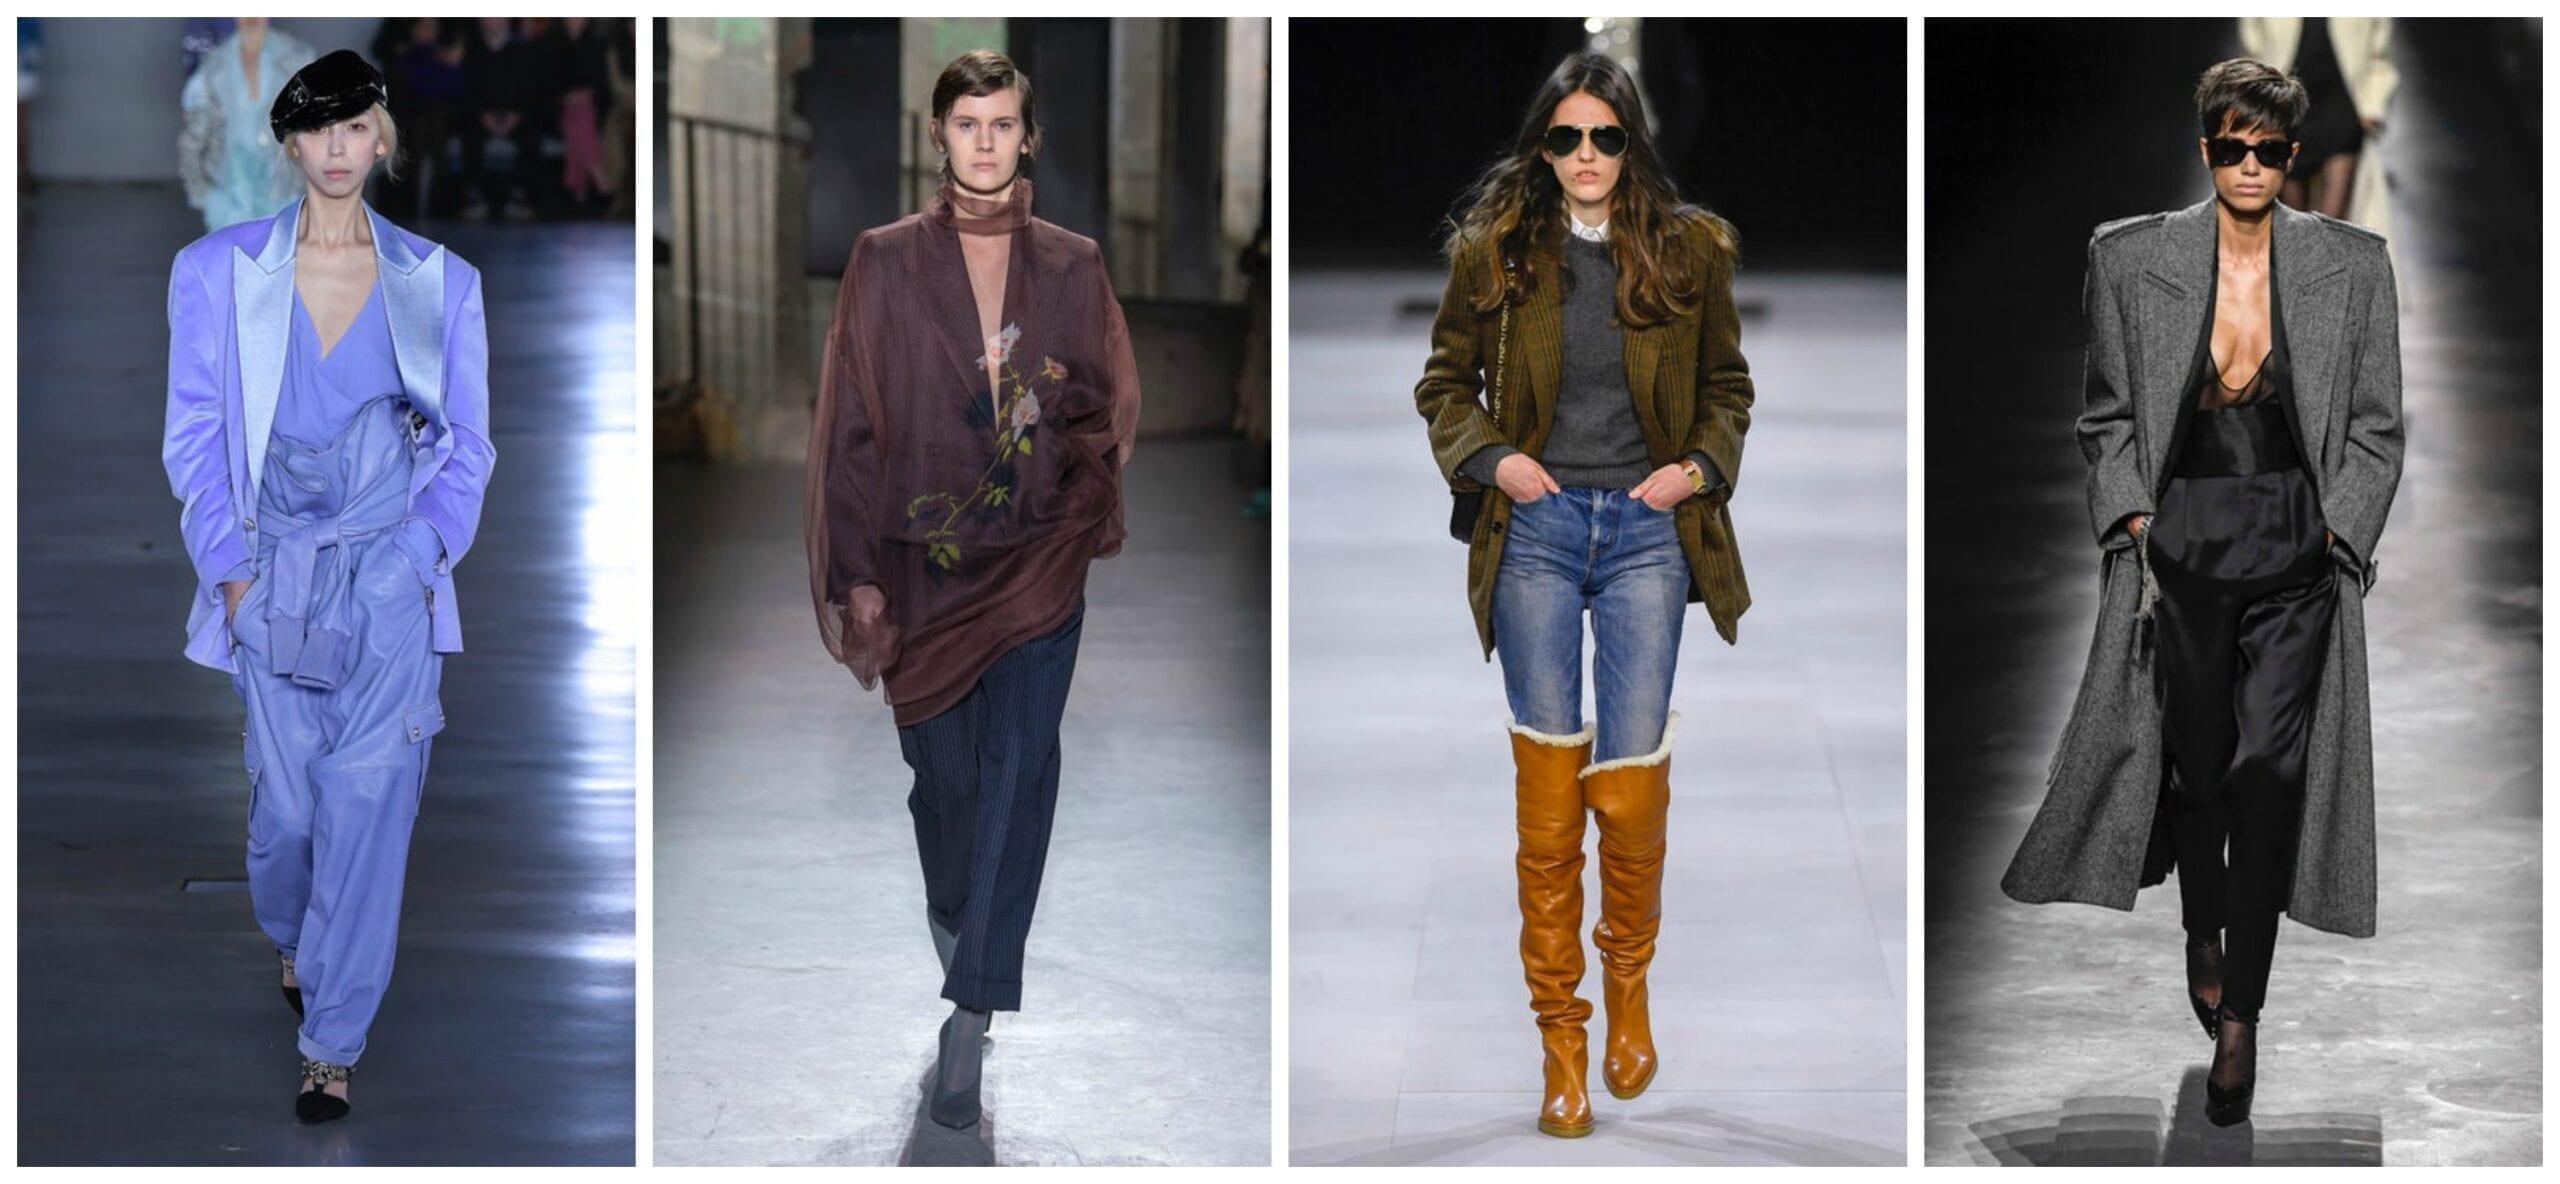 Moda streetwear 2019, paris fashion week 2019, theladycracy.it, fashion blogger famose italiane 2019